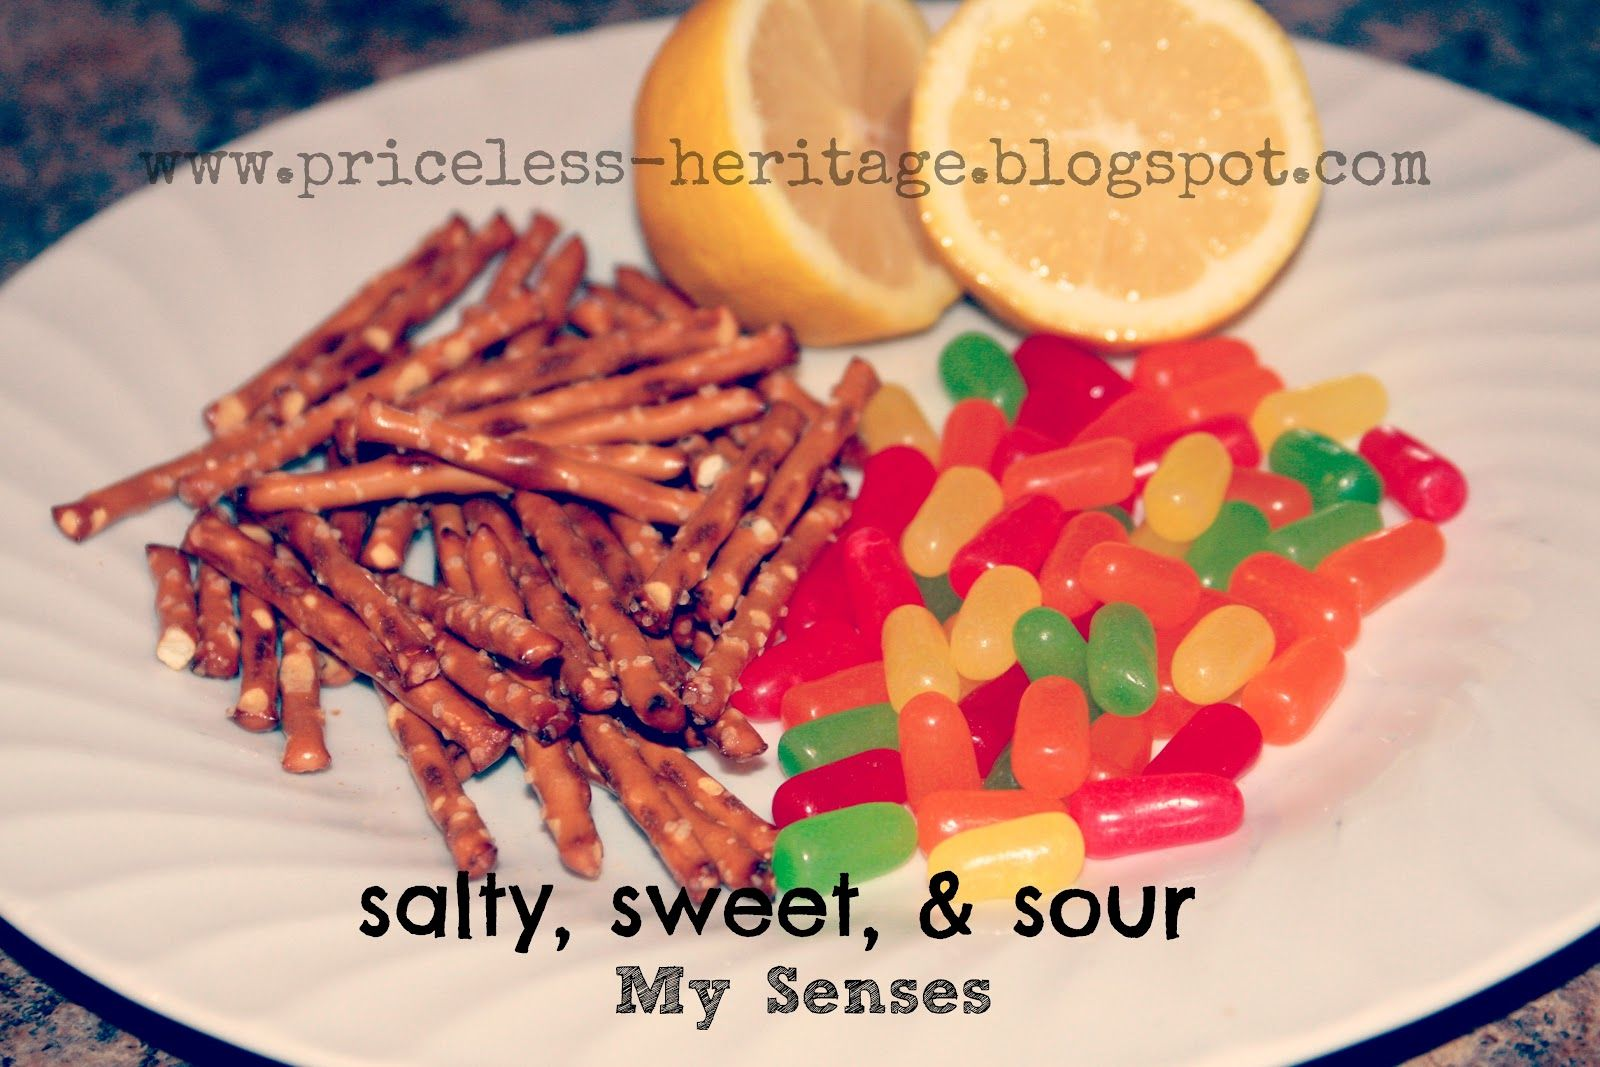 Five Senses Taste